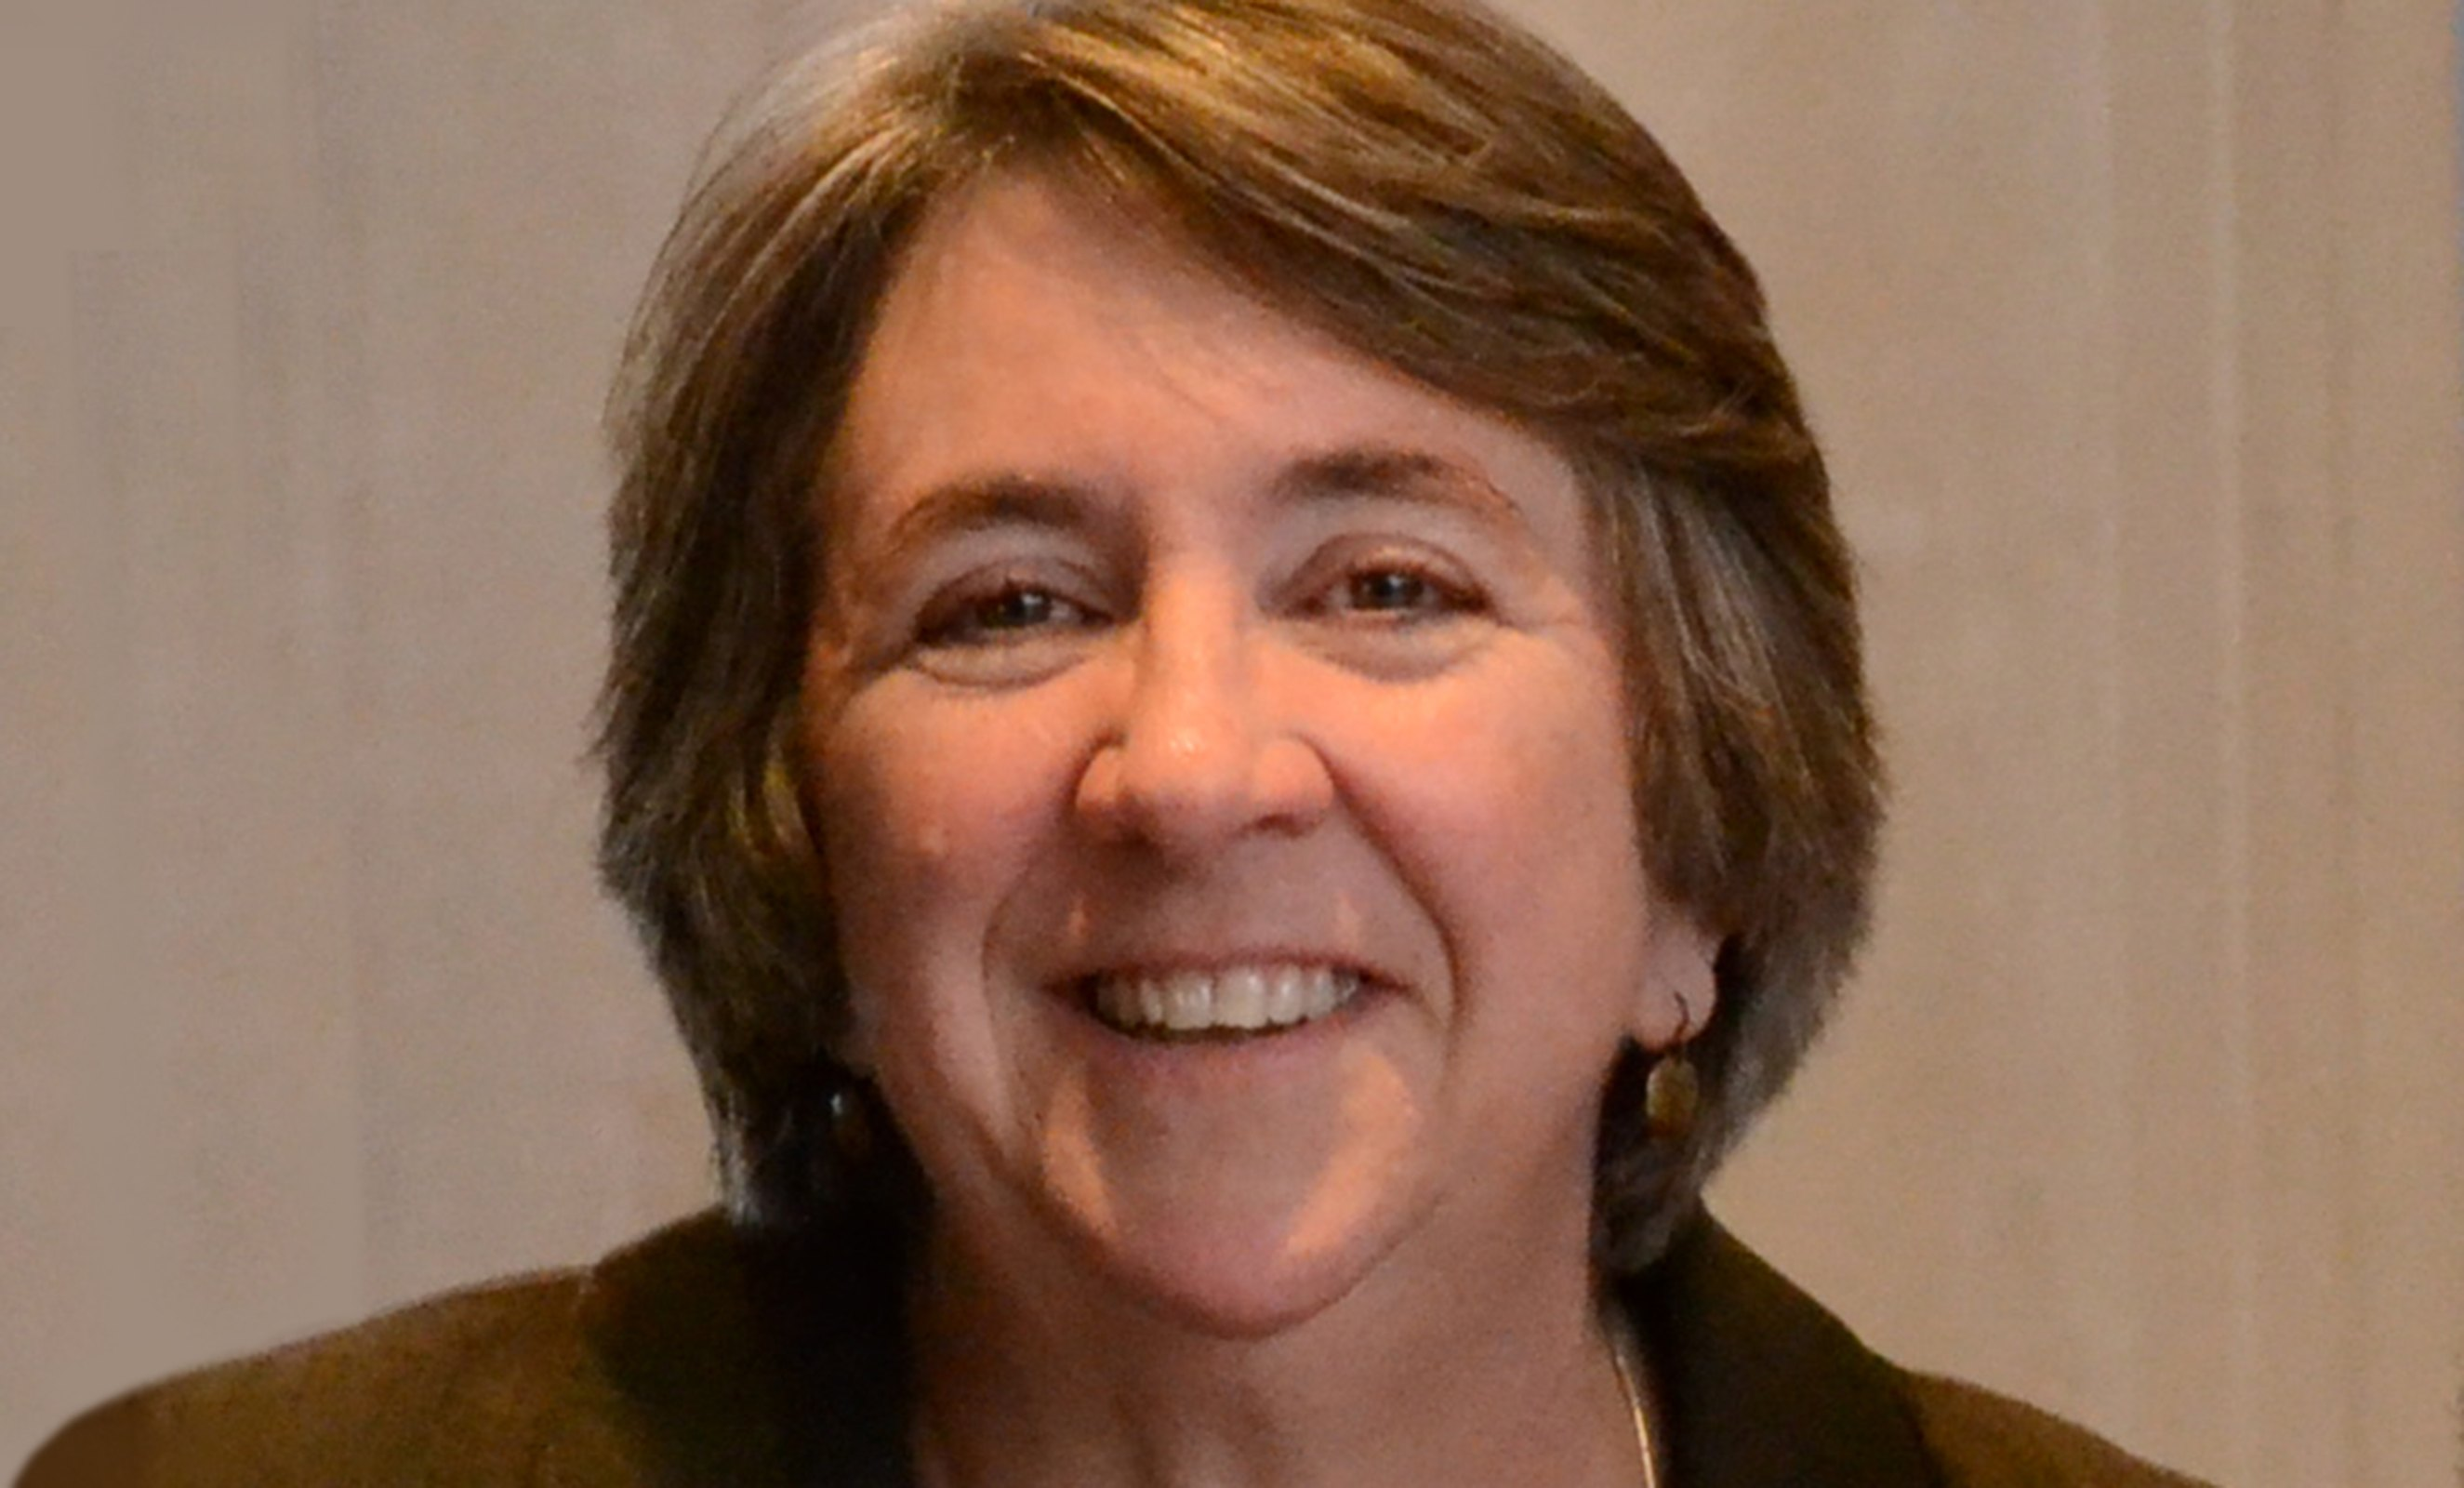 Justice Elizabeth Garry. Photo: Courtesy of Albany Law School